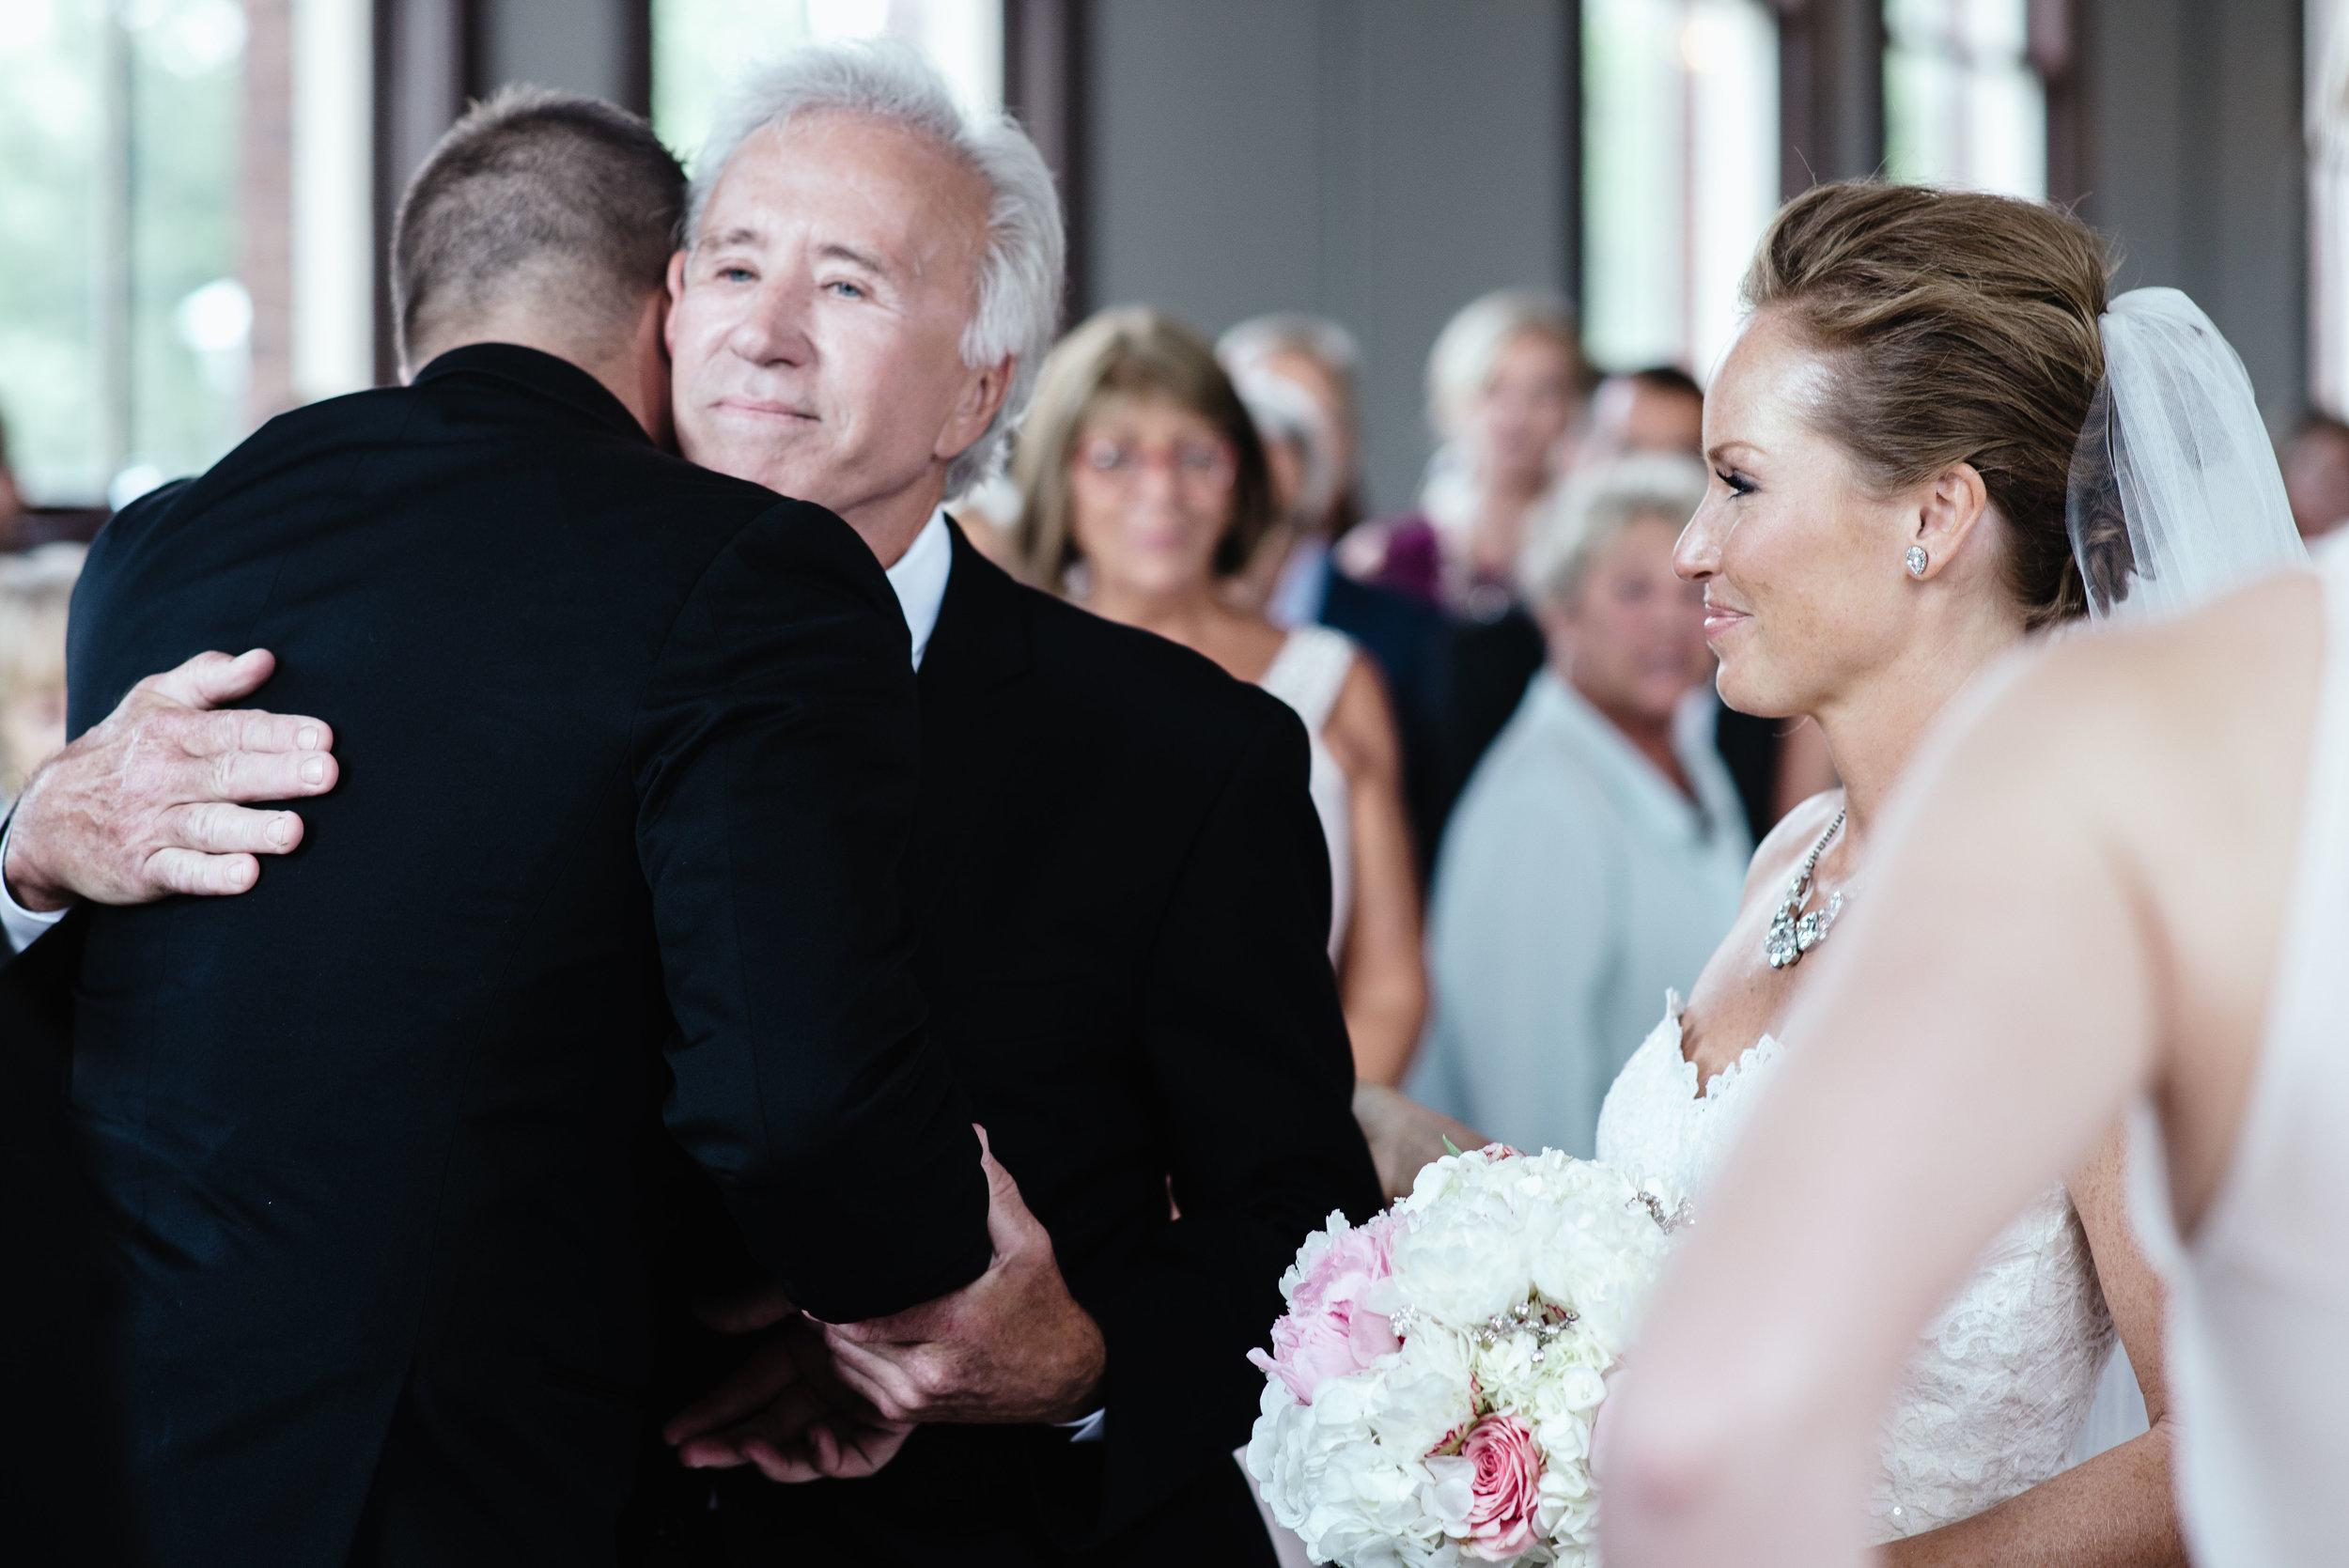 Mina-Steve-Blog-Indianapolis-Wedding-83.jpg